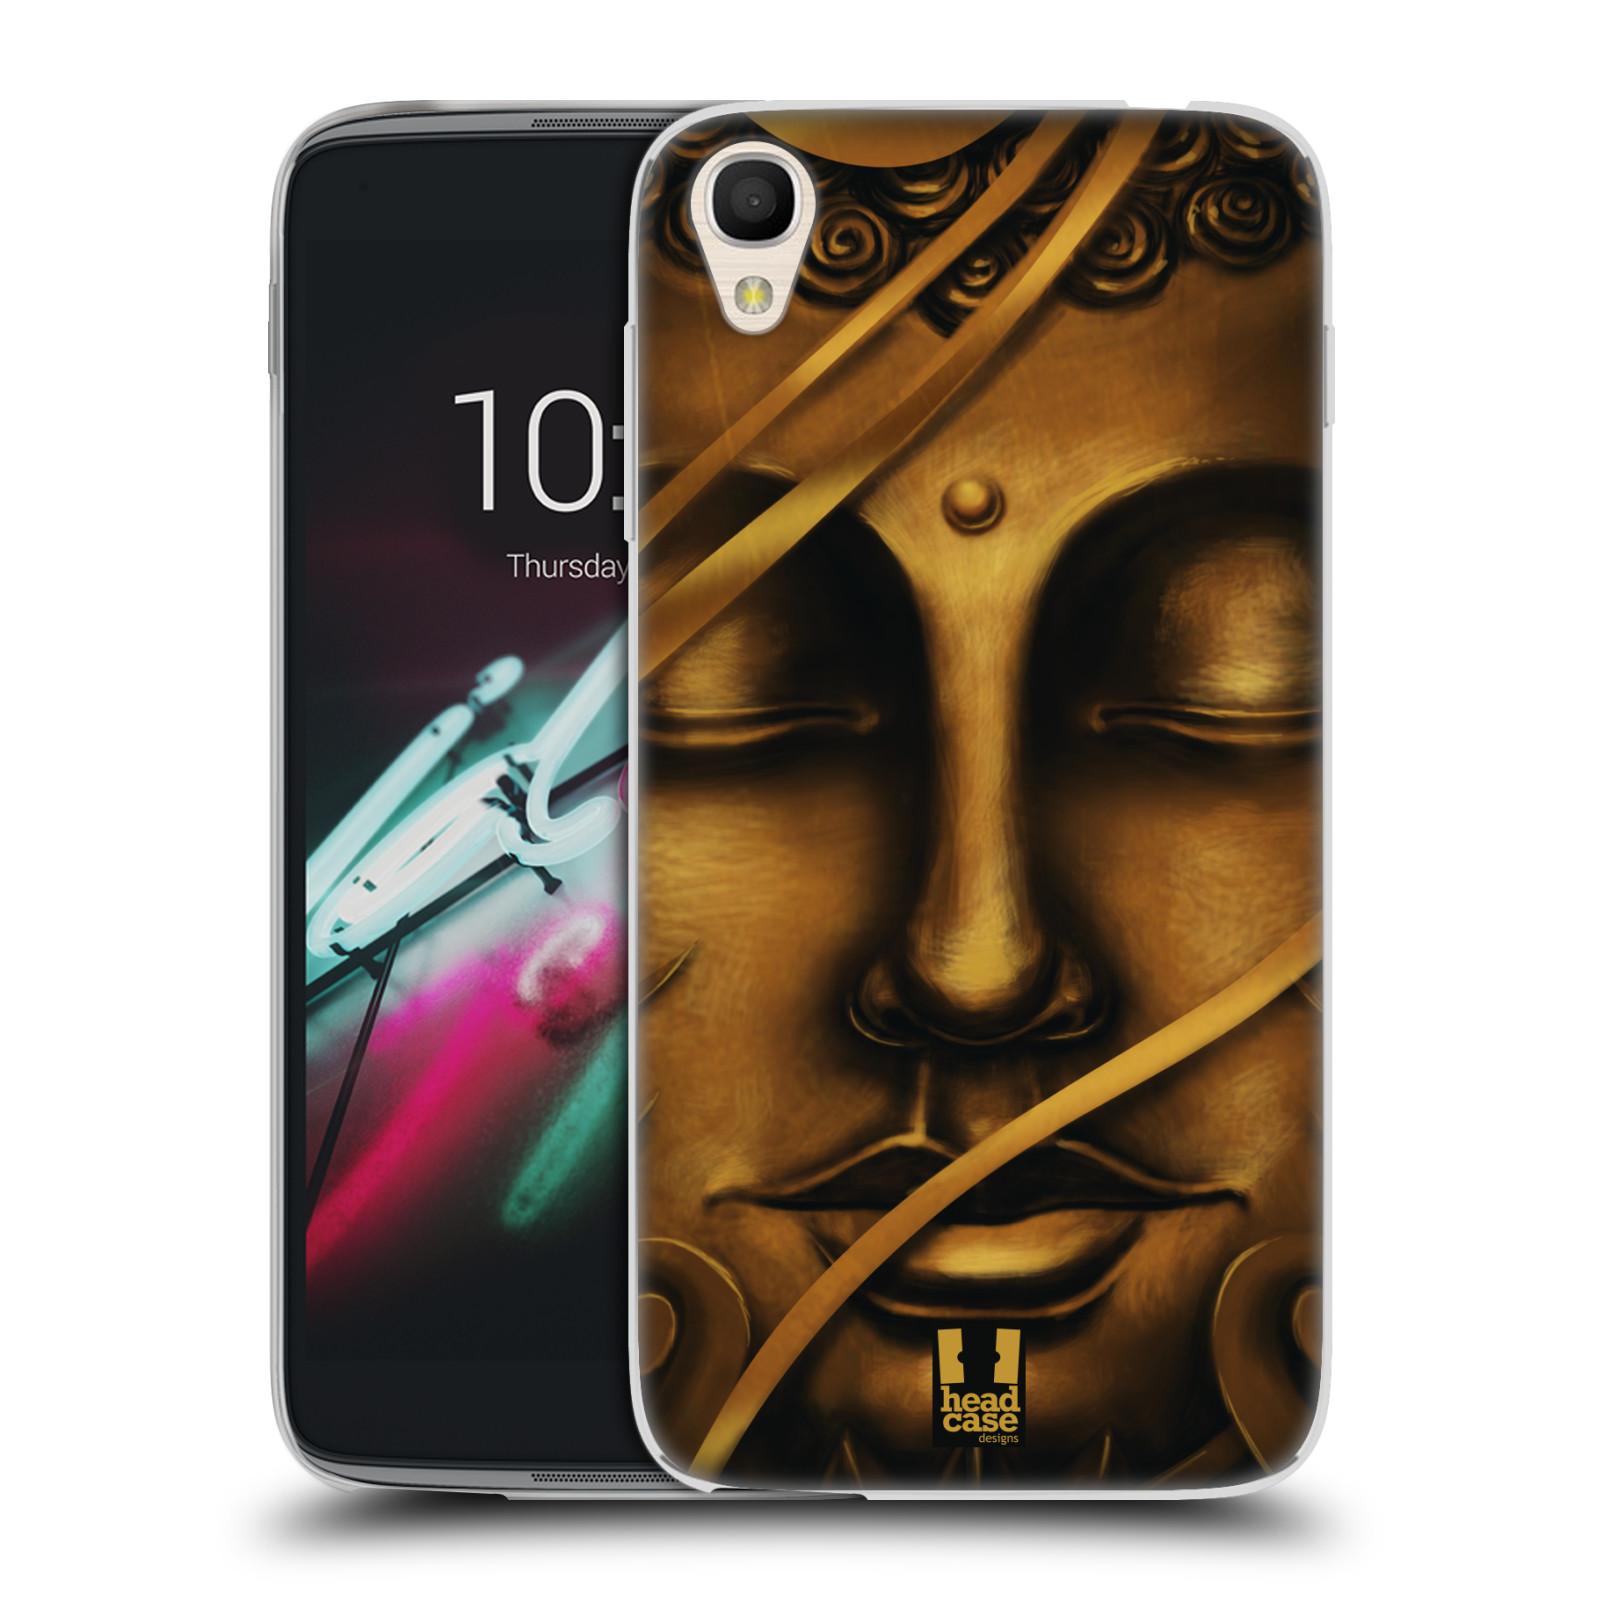 HEAD CASE silikonový obal na mobil Alcatel Idol 3 OT-6039Y (4.7) vzor BUDDHA ZLATÝ BUDHA